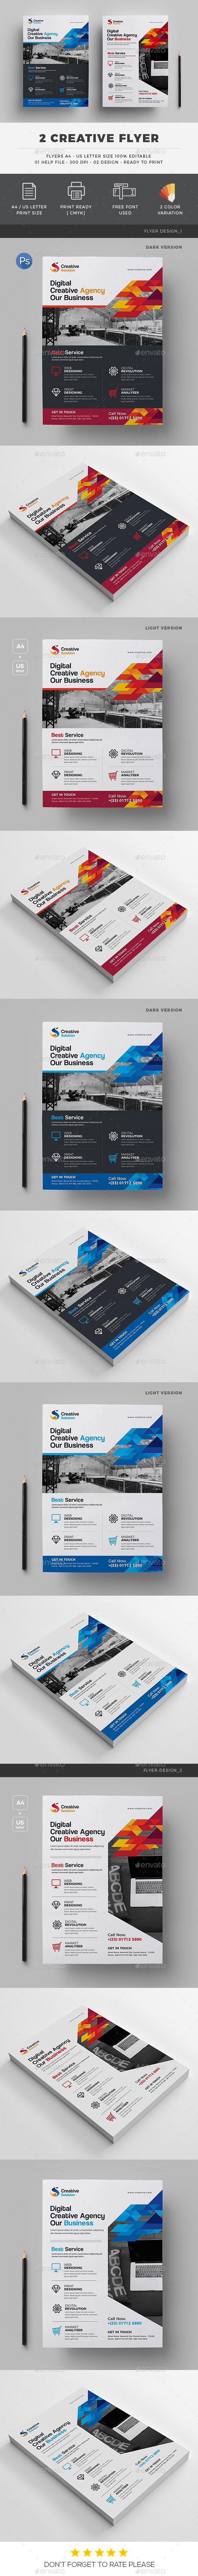 Flyer 2 Design Templates PSD